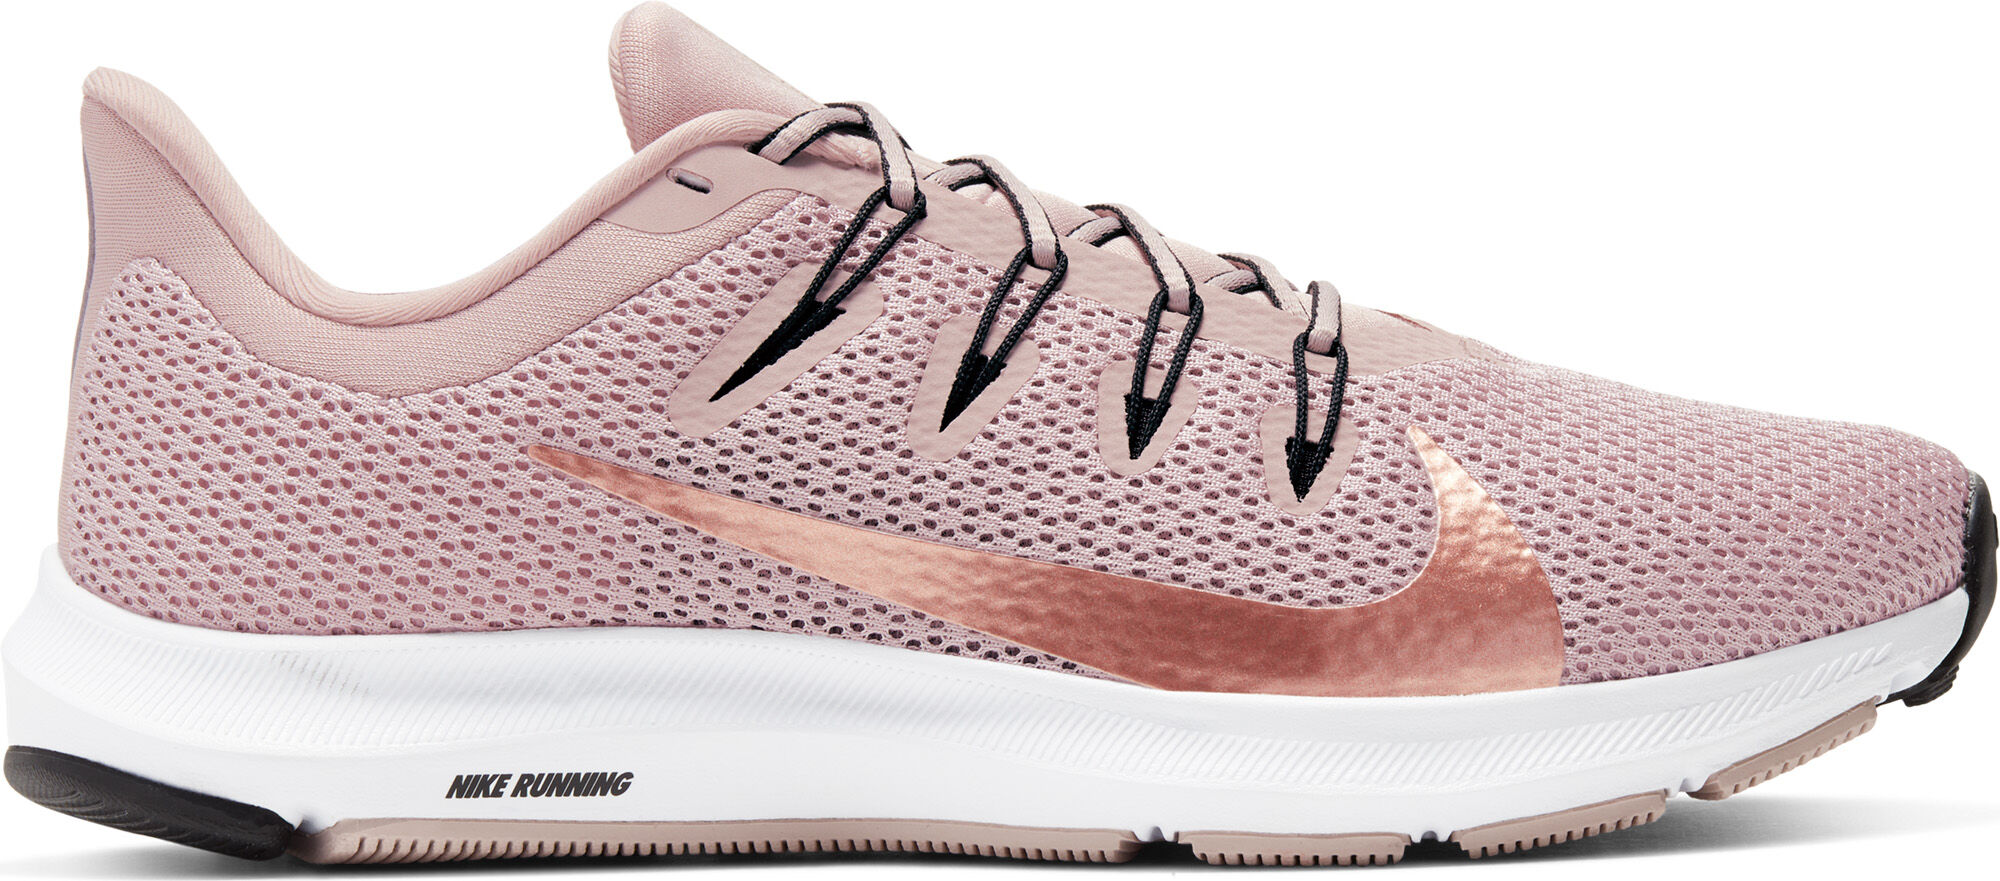 Stort Udvalg Nike Nike Shox OZ Par Sko Billige Priser   Nike